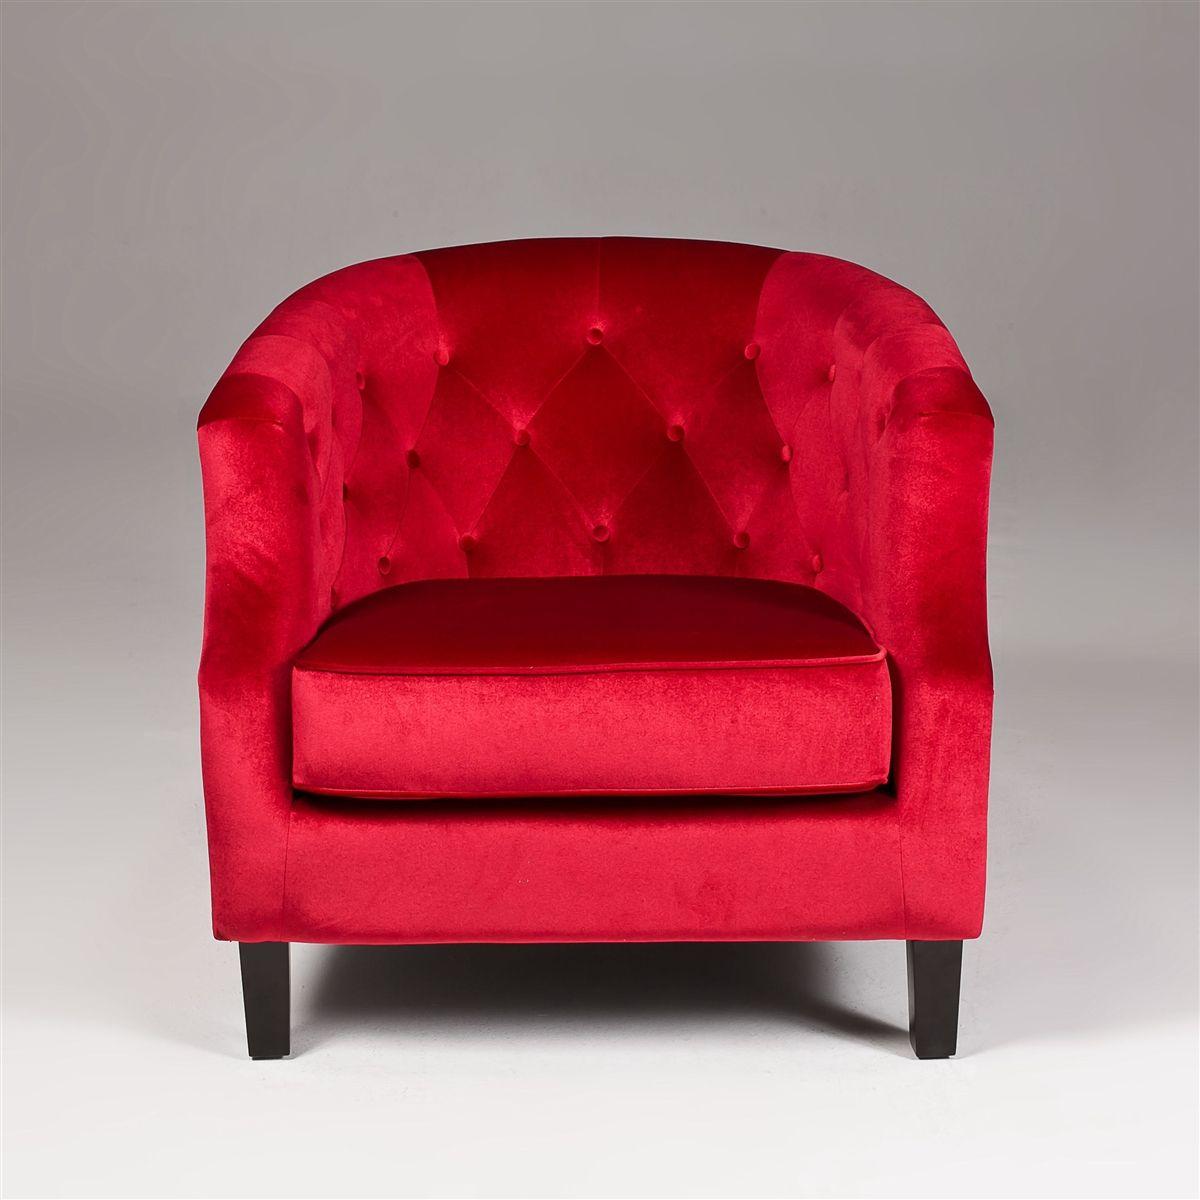 Red Velvet Sofa Red Accent Chair Velvet Accent Chair Red